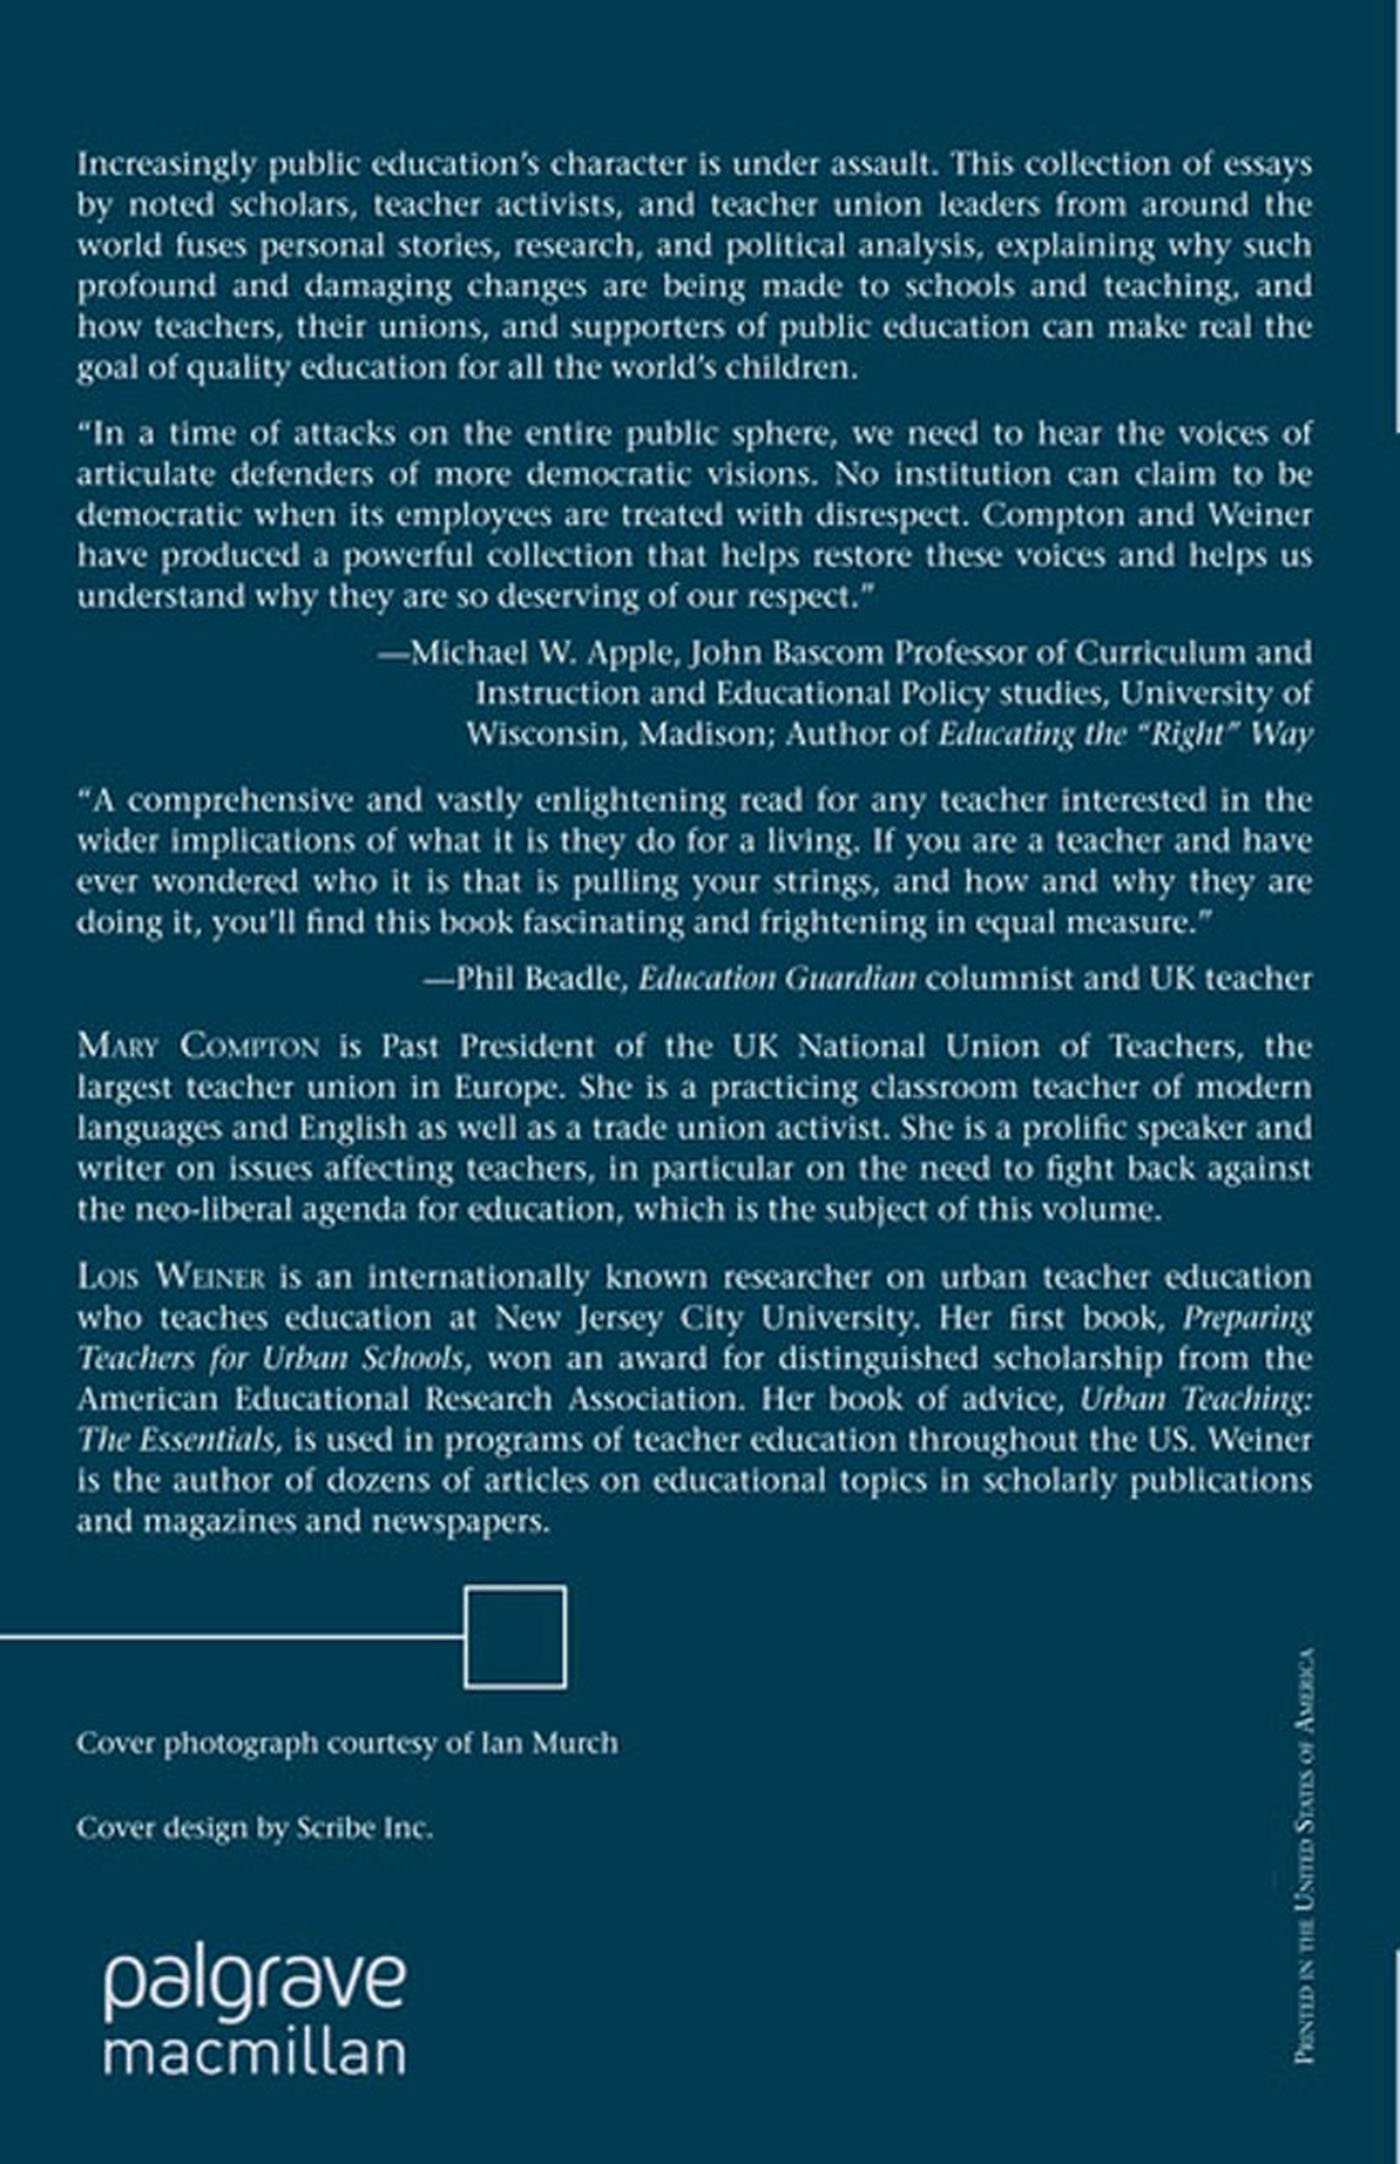 scribe america cover letter - Hizir kaptanband co